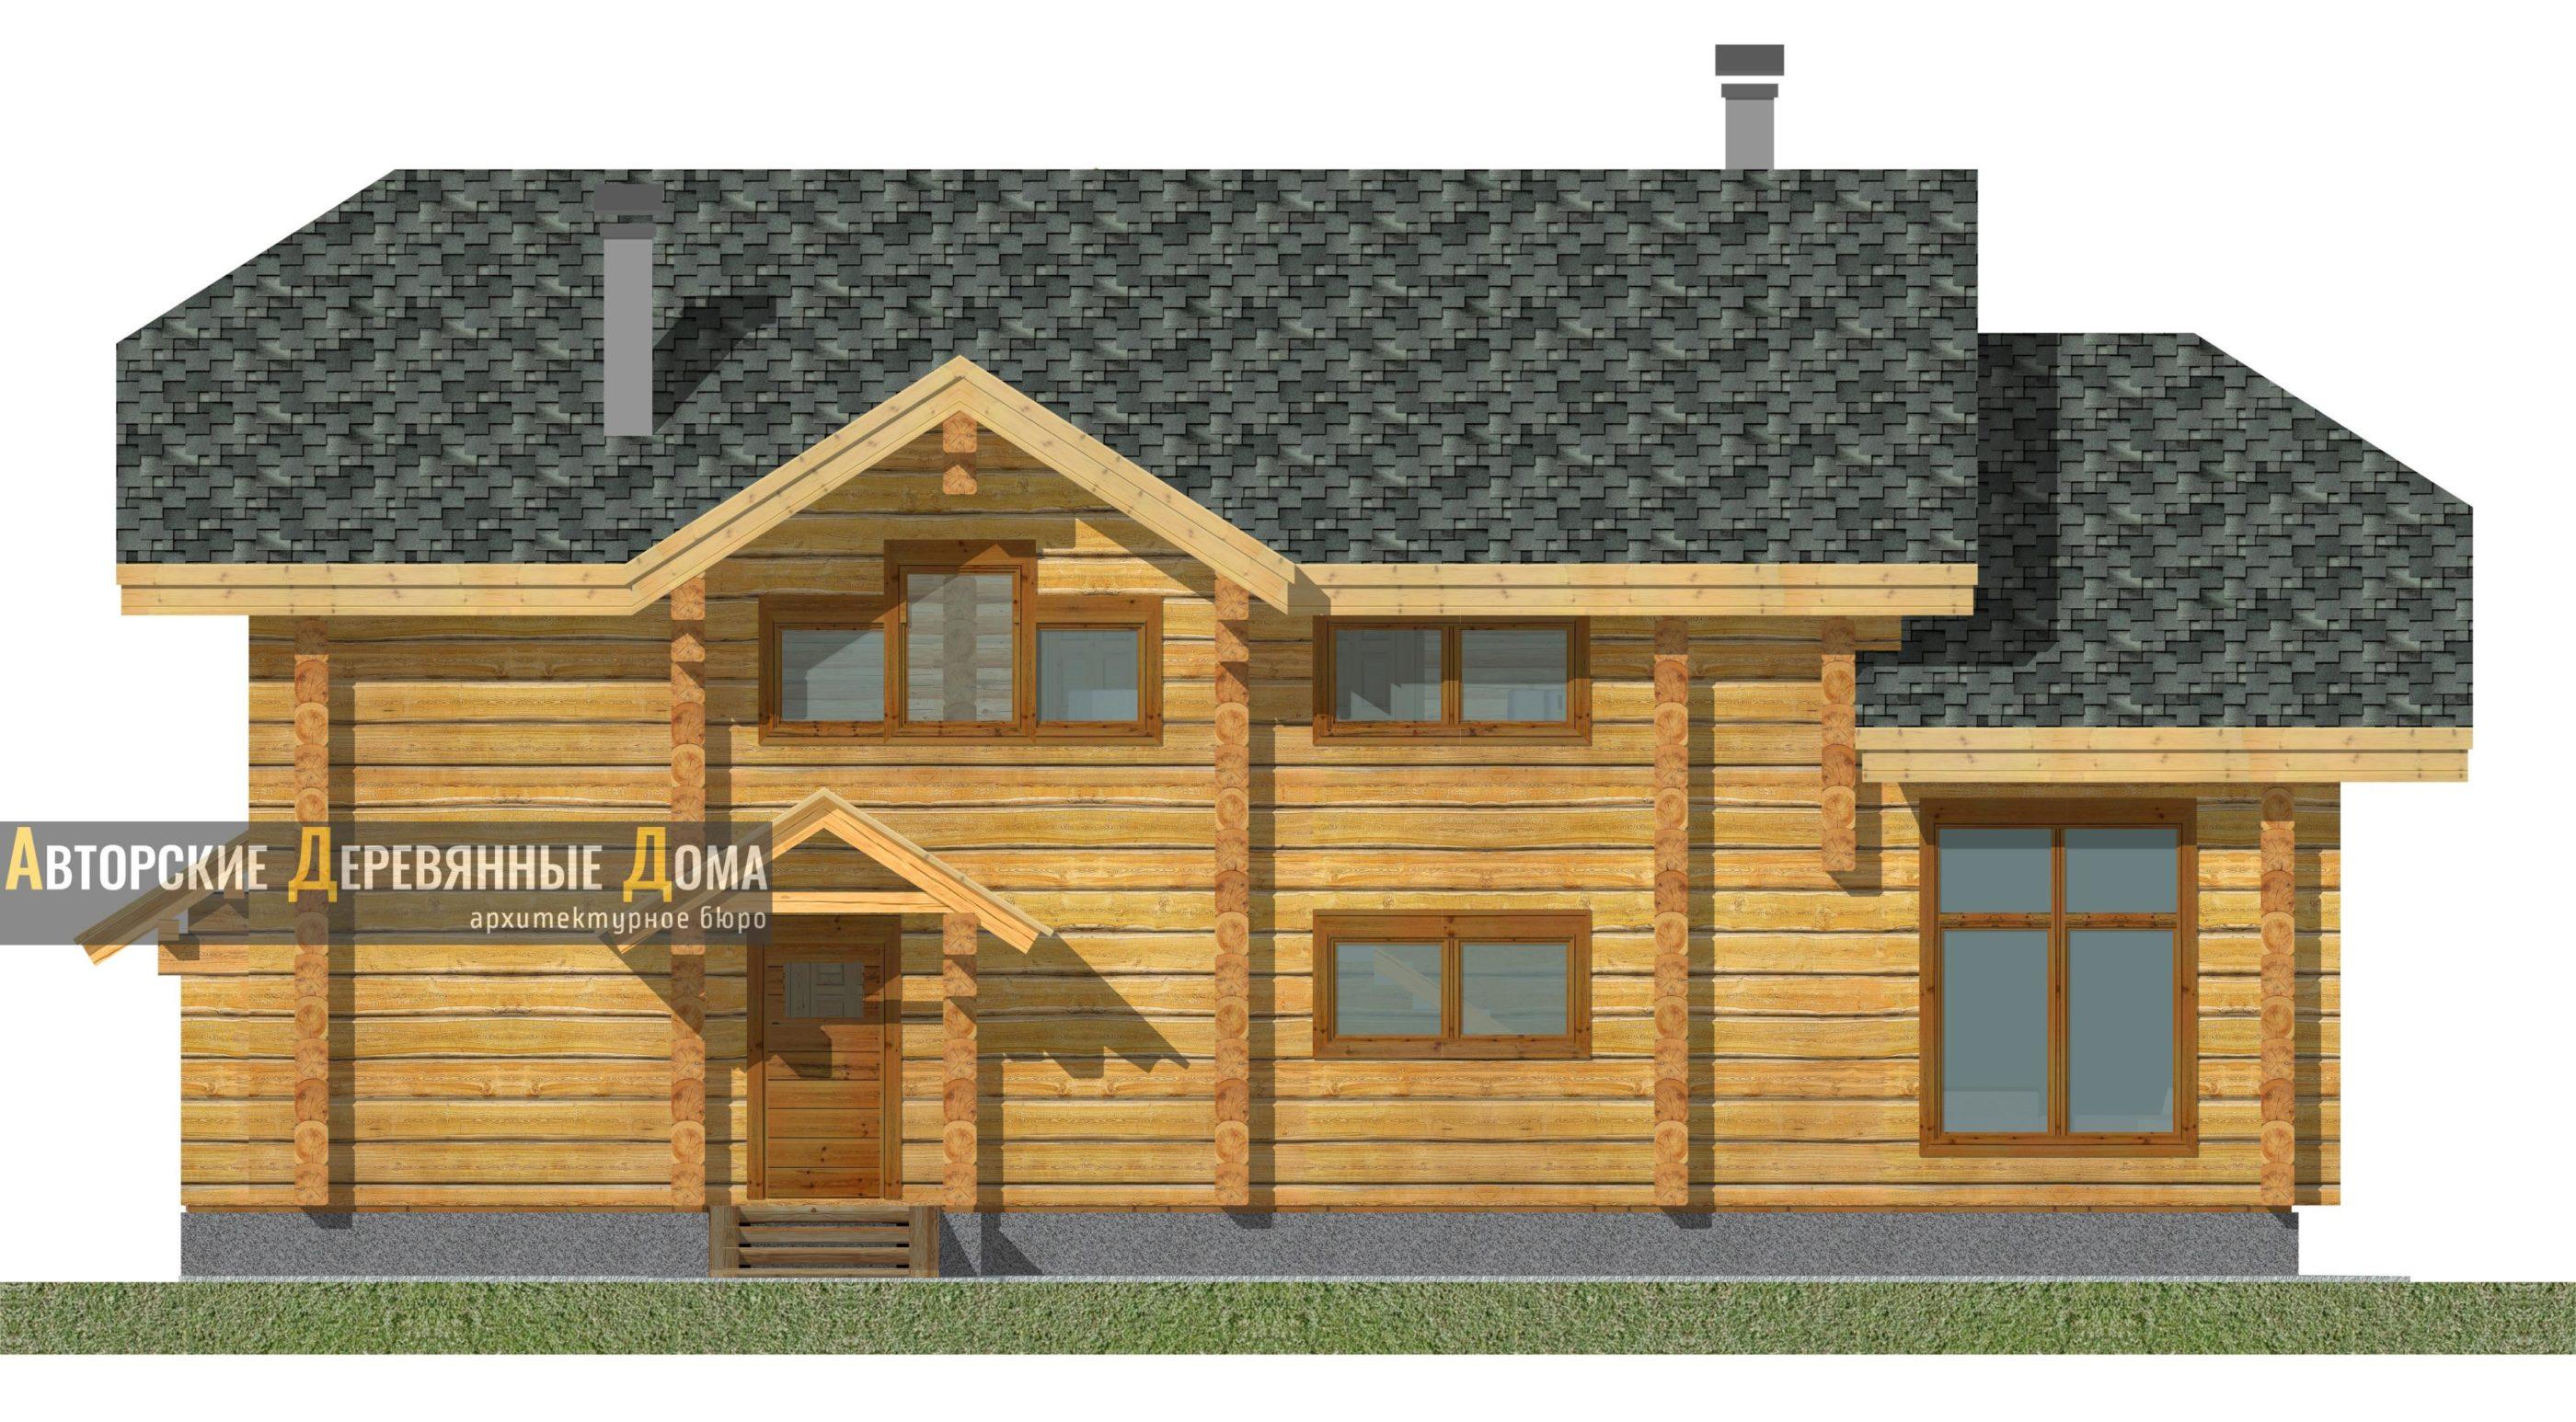 Дом-баня-беседка – фасад 4